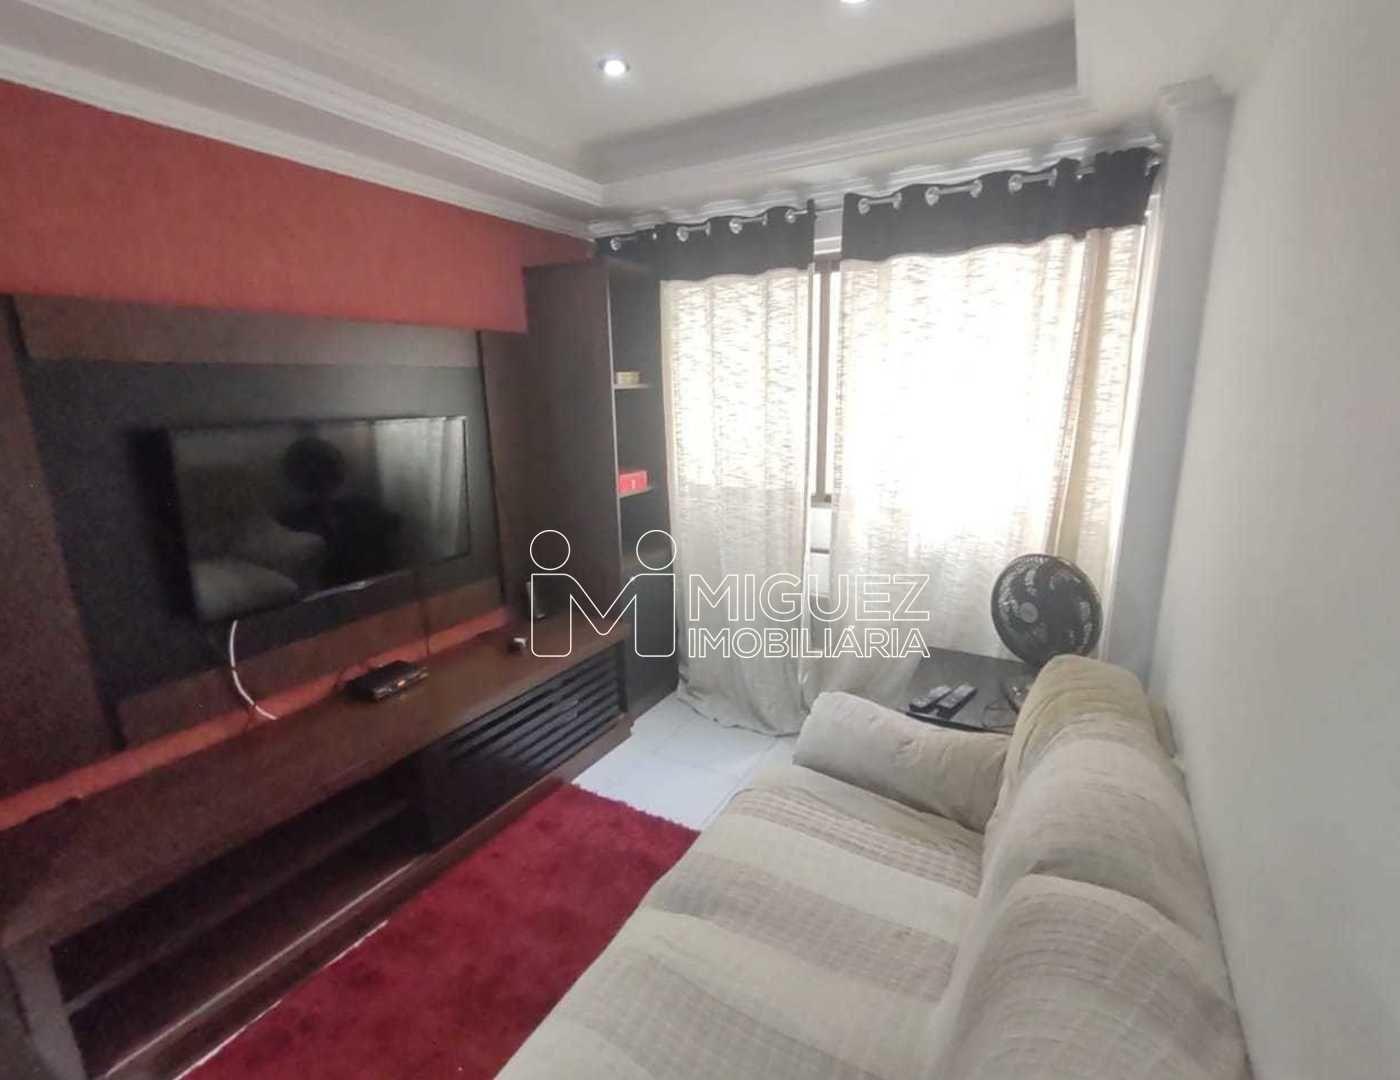 Apartamento, aluguel, Rua Isidro de Figueiredo - Tijuca , Rio de janeiro